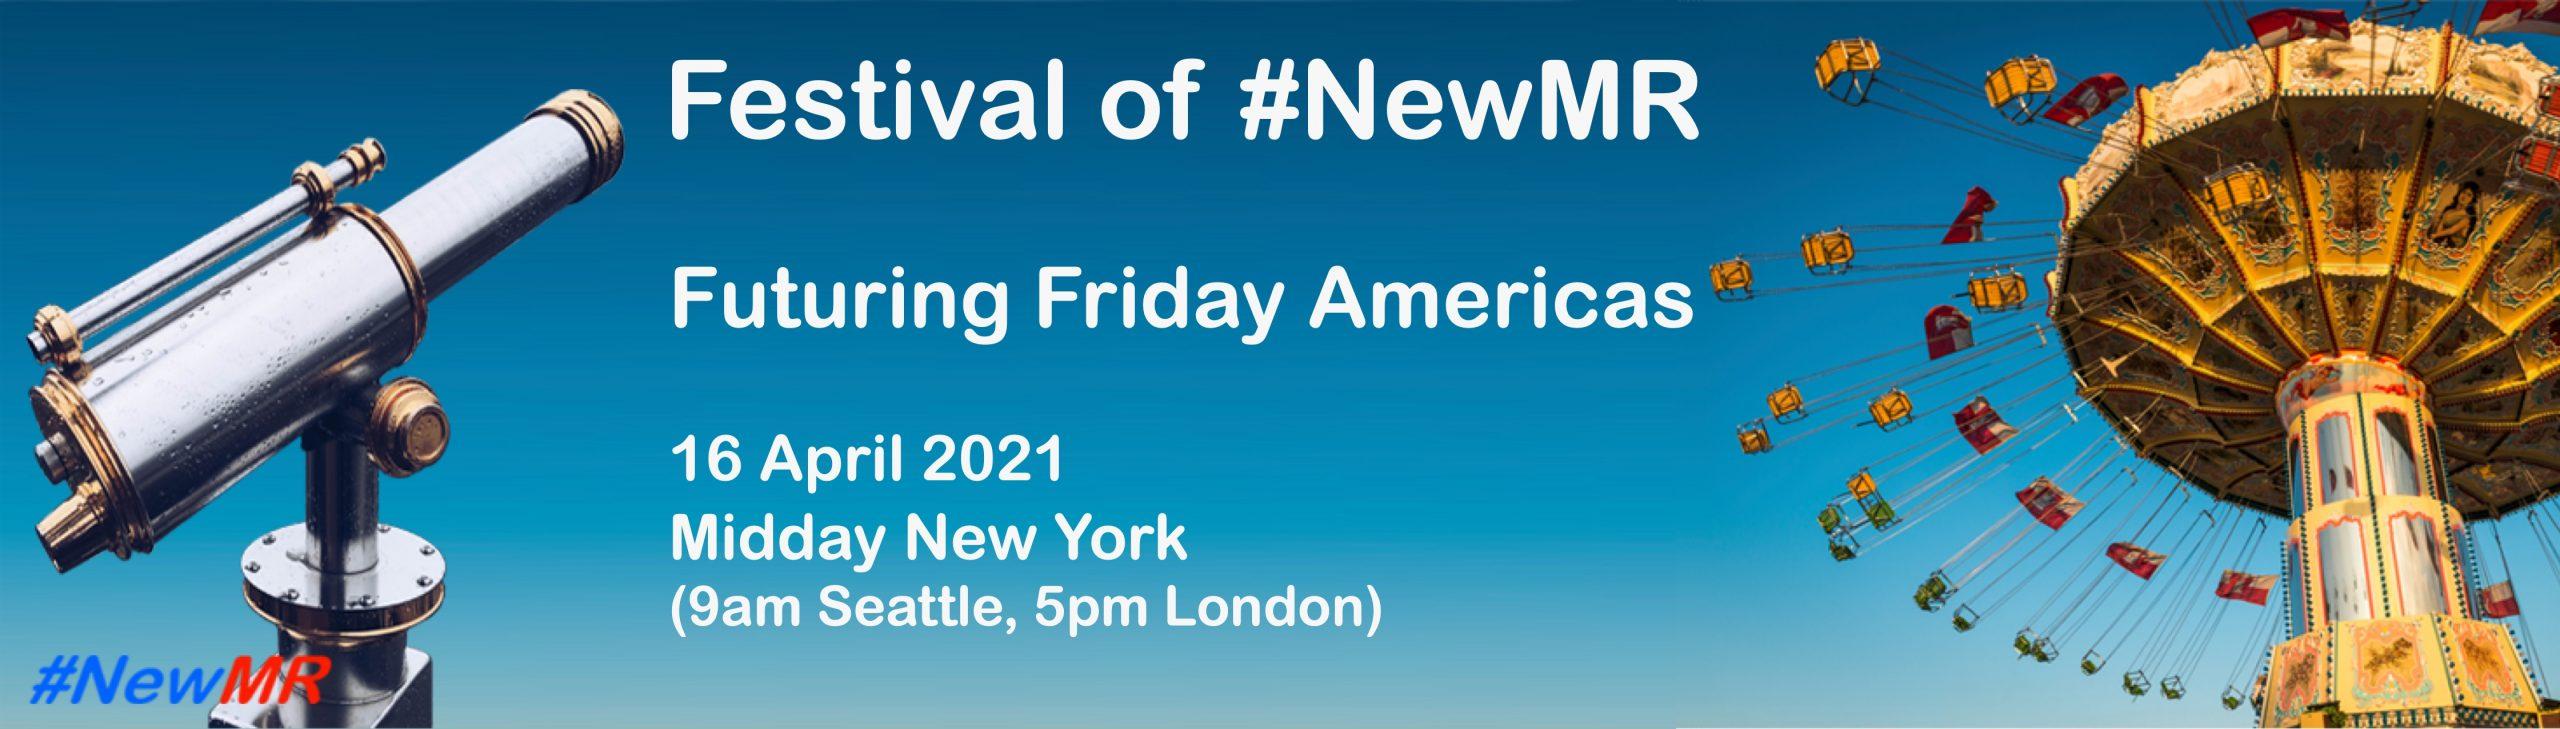 Banner for Futuring Friday Americas Webinar 2021